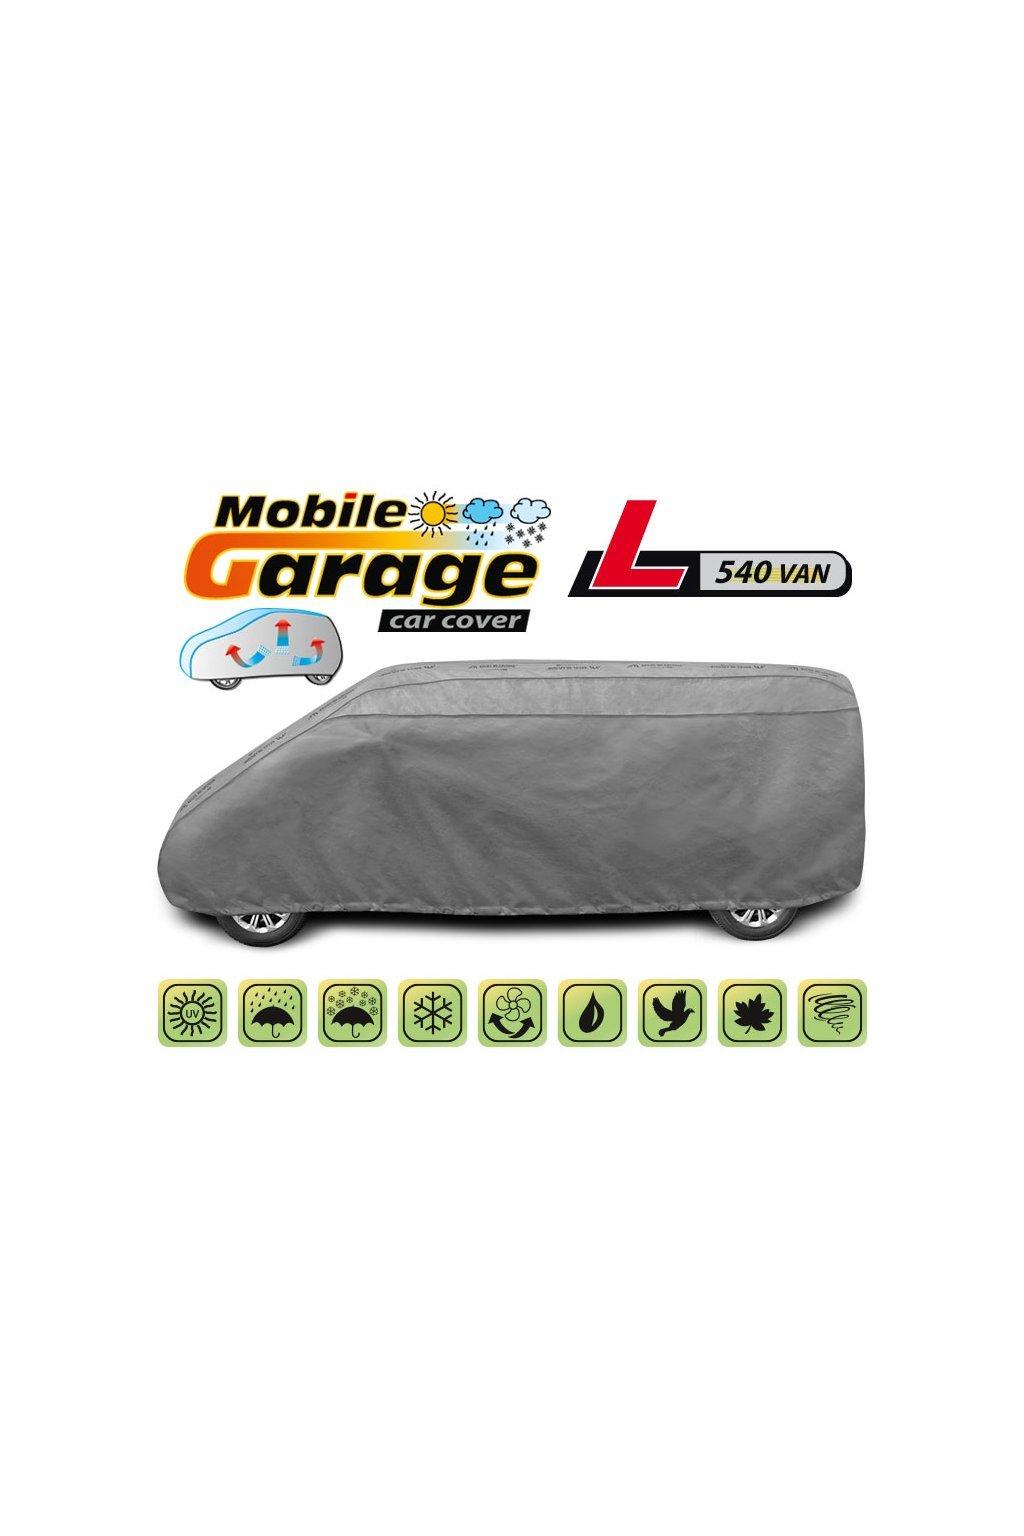 2994 autoplachta mobile garage l540 van